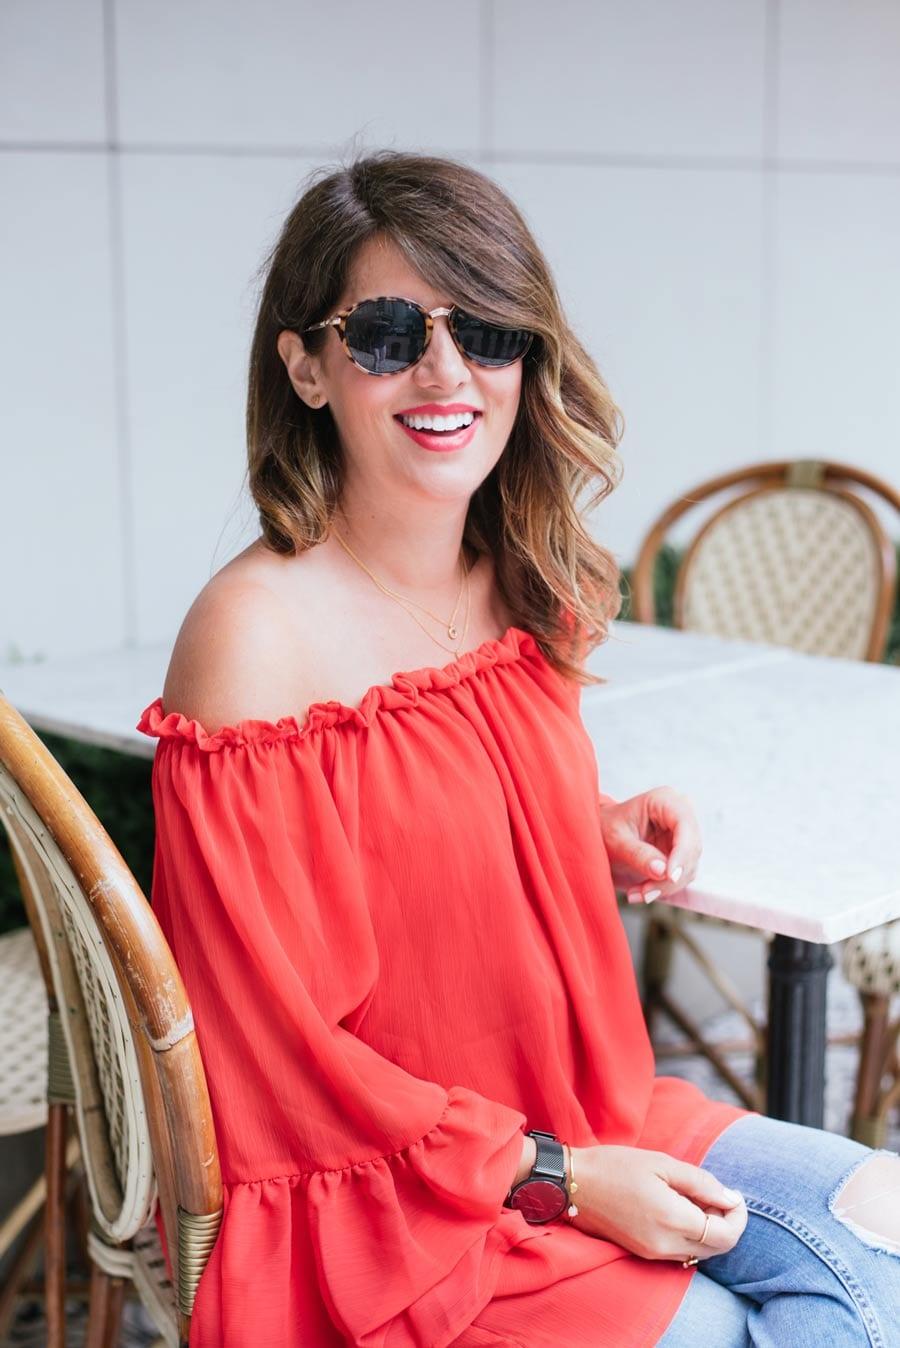 Jillian-Harris-Chic-Wish-Red-Dress-03